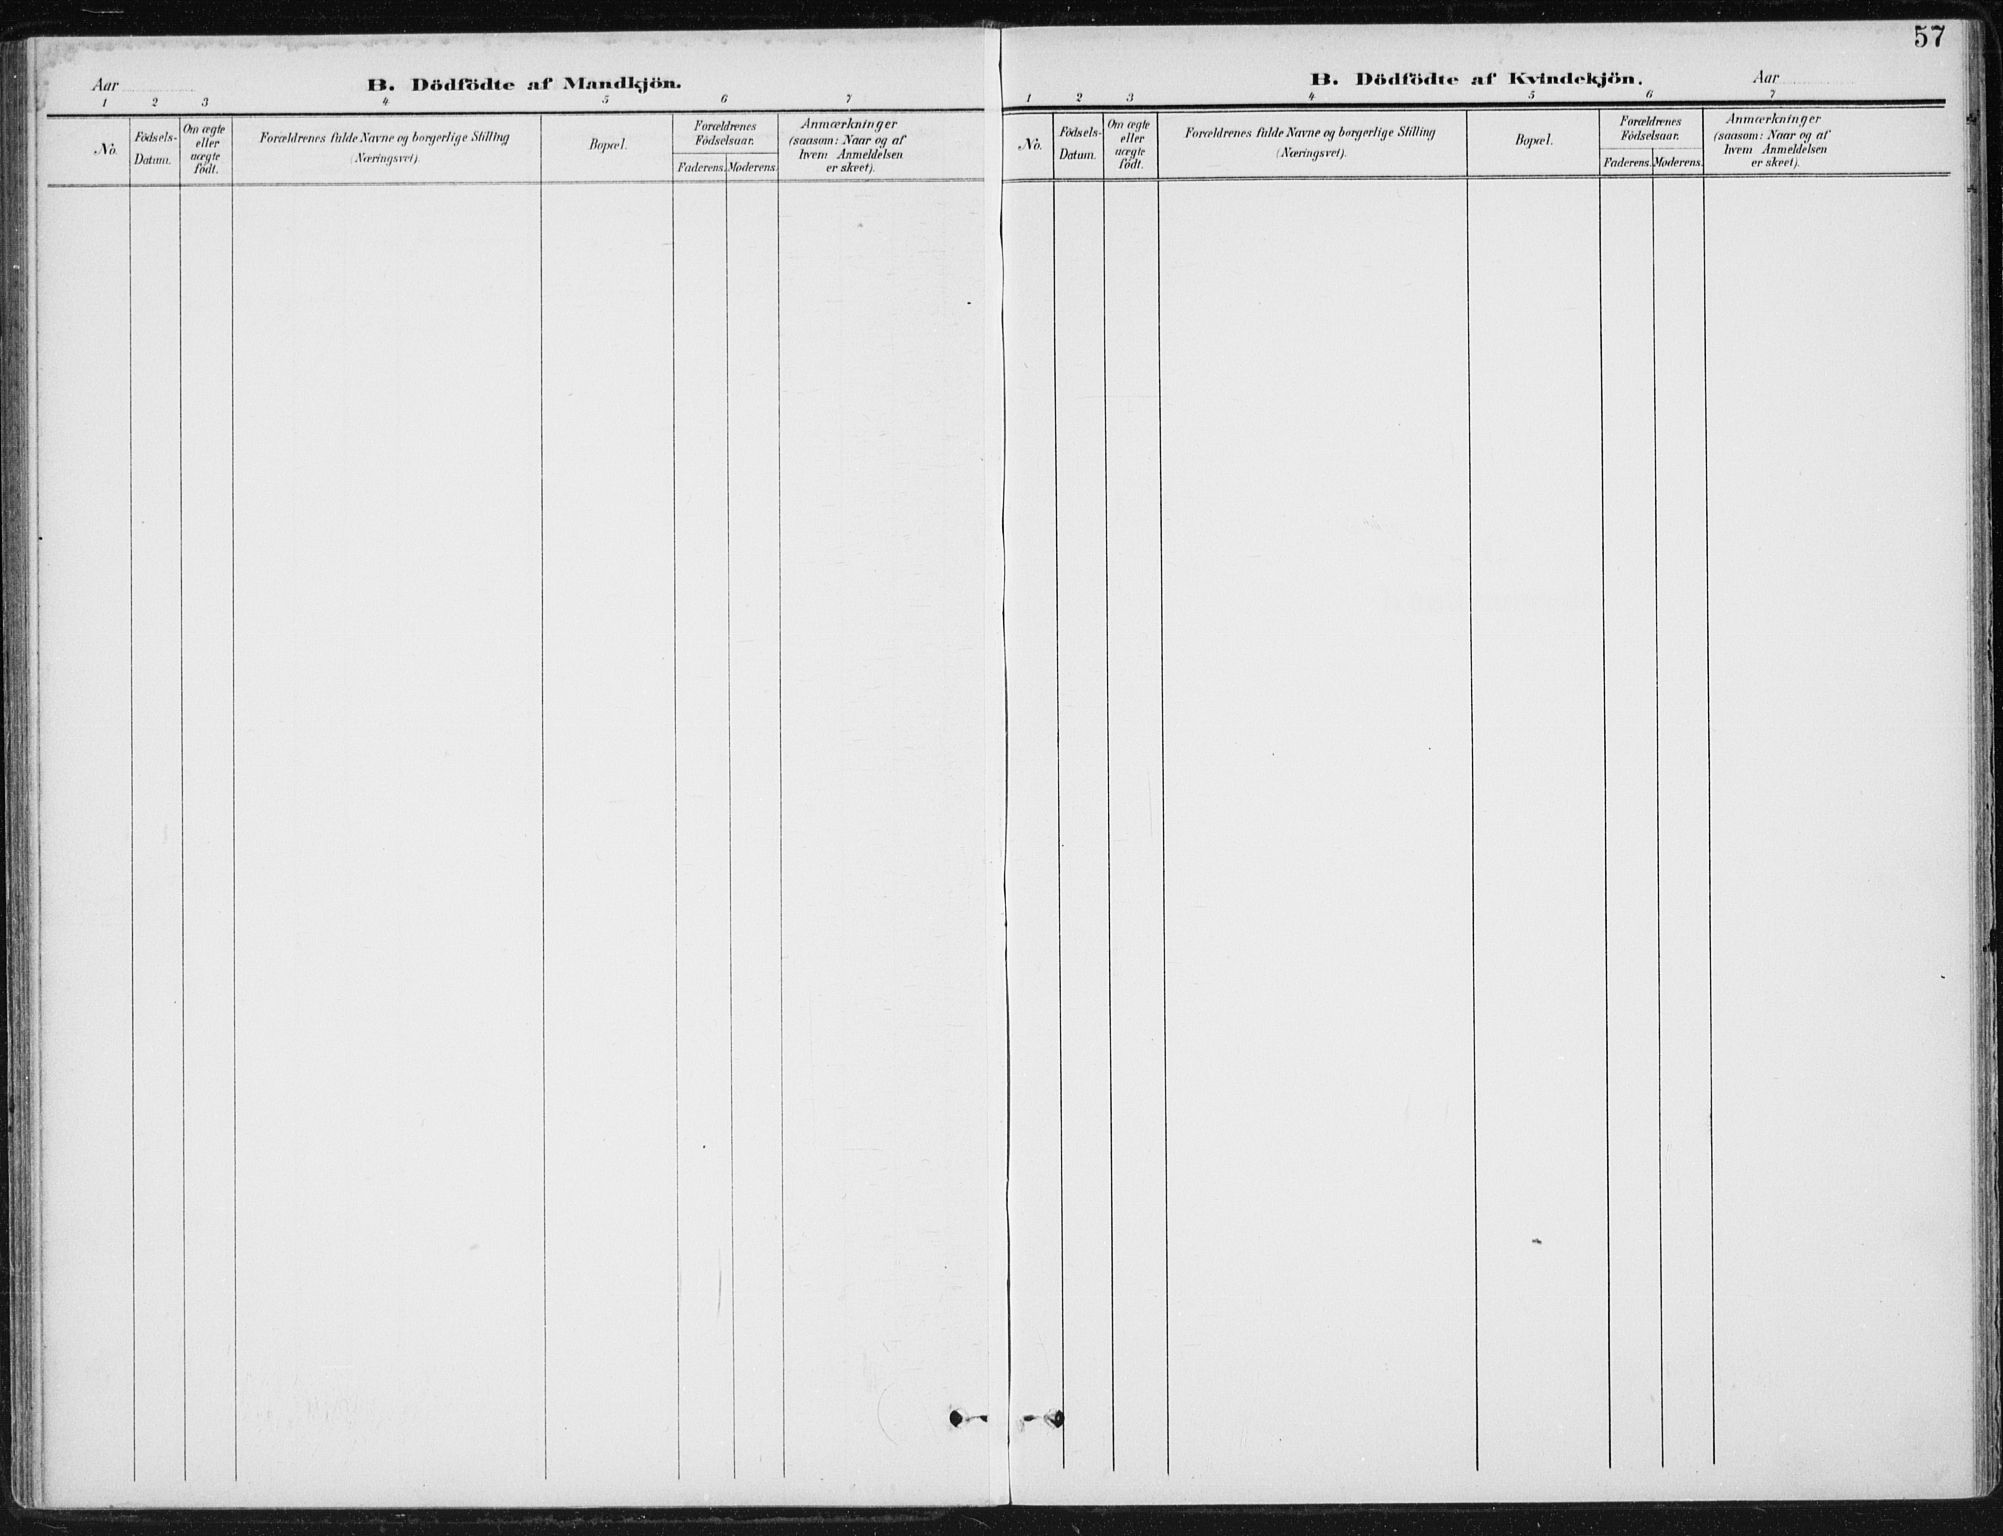 SAH, Østre Gausdal prestekontor, Ministerialbok nr. 5, 1902-1920, s. 57